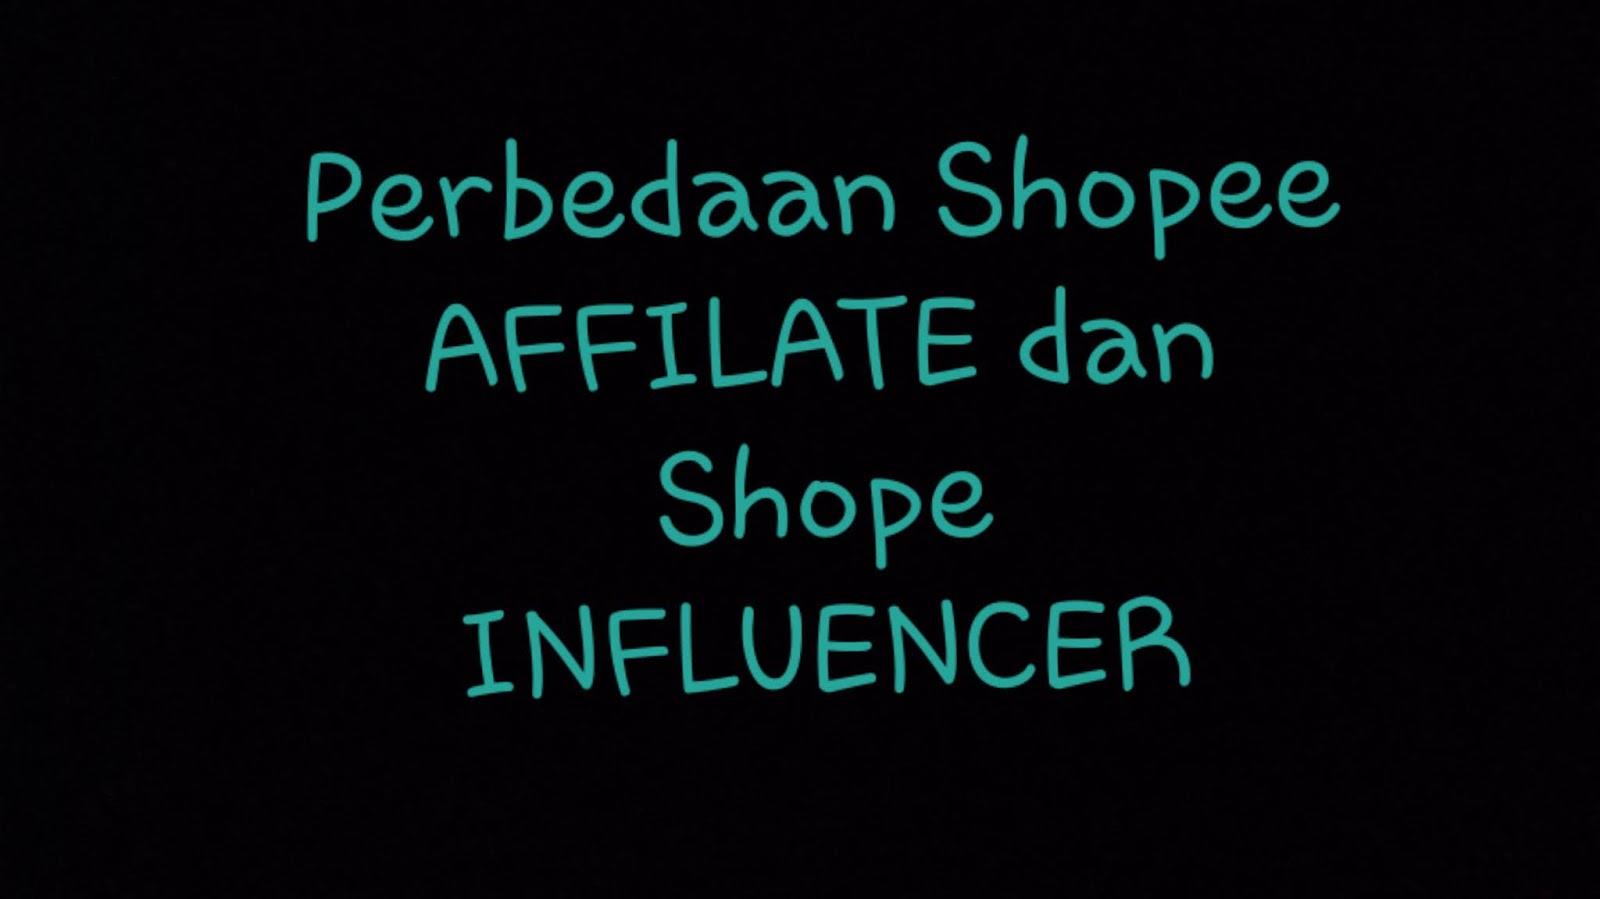 Perbedaan Shopee AFFILATE Shopee INFLUENCER di Affiliates Program